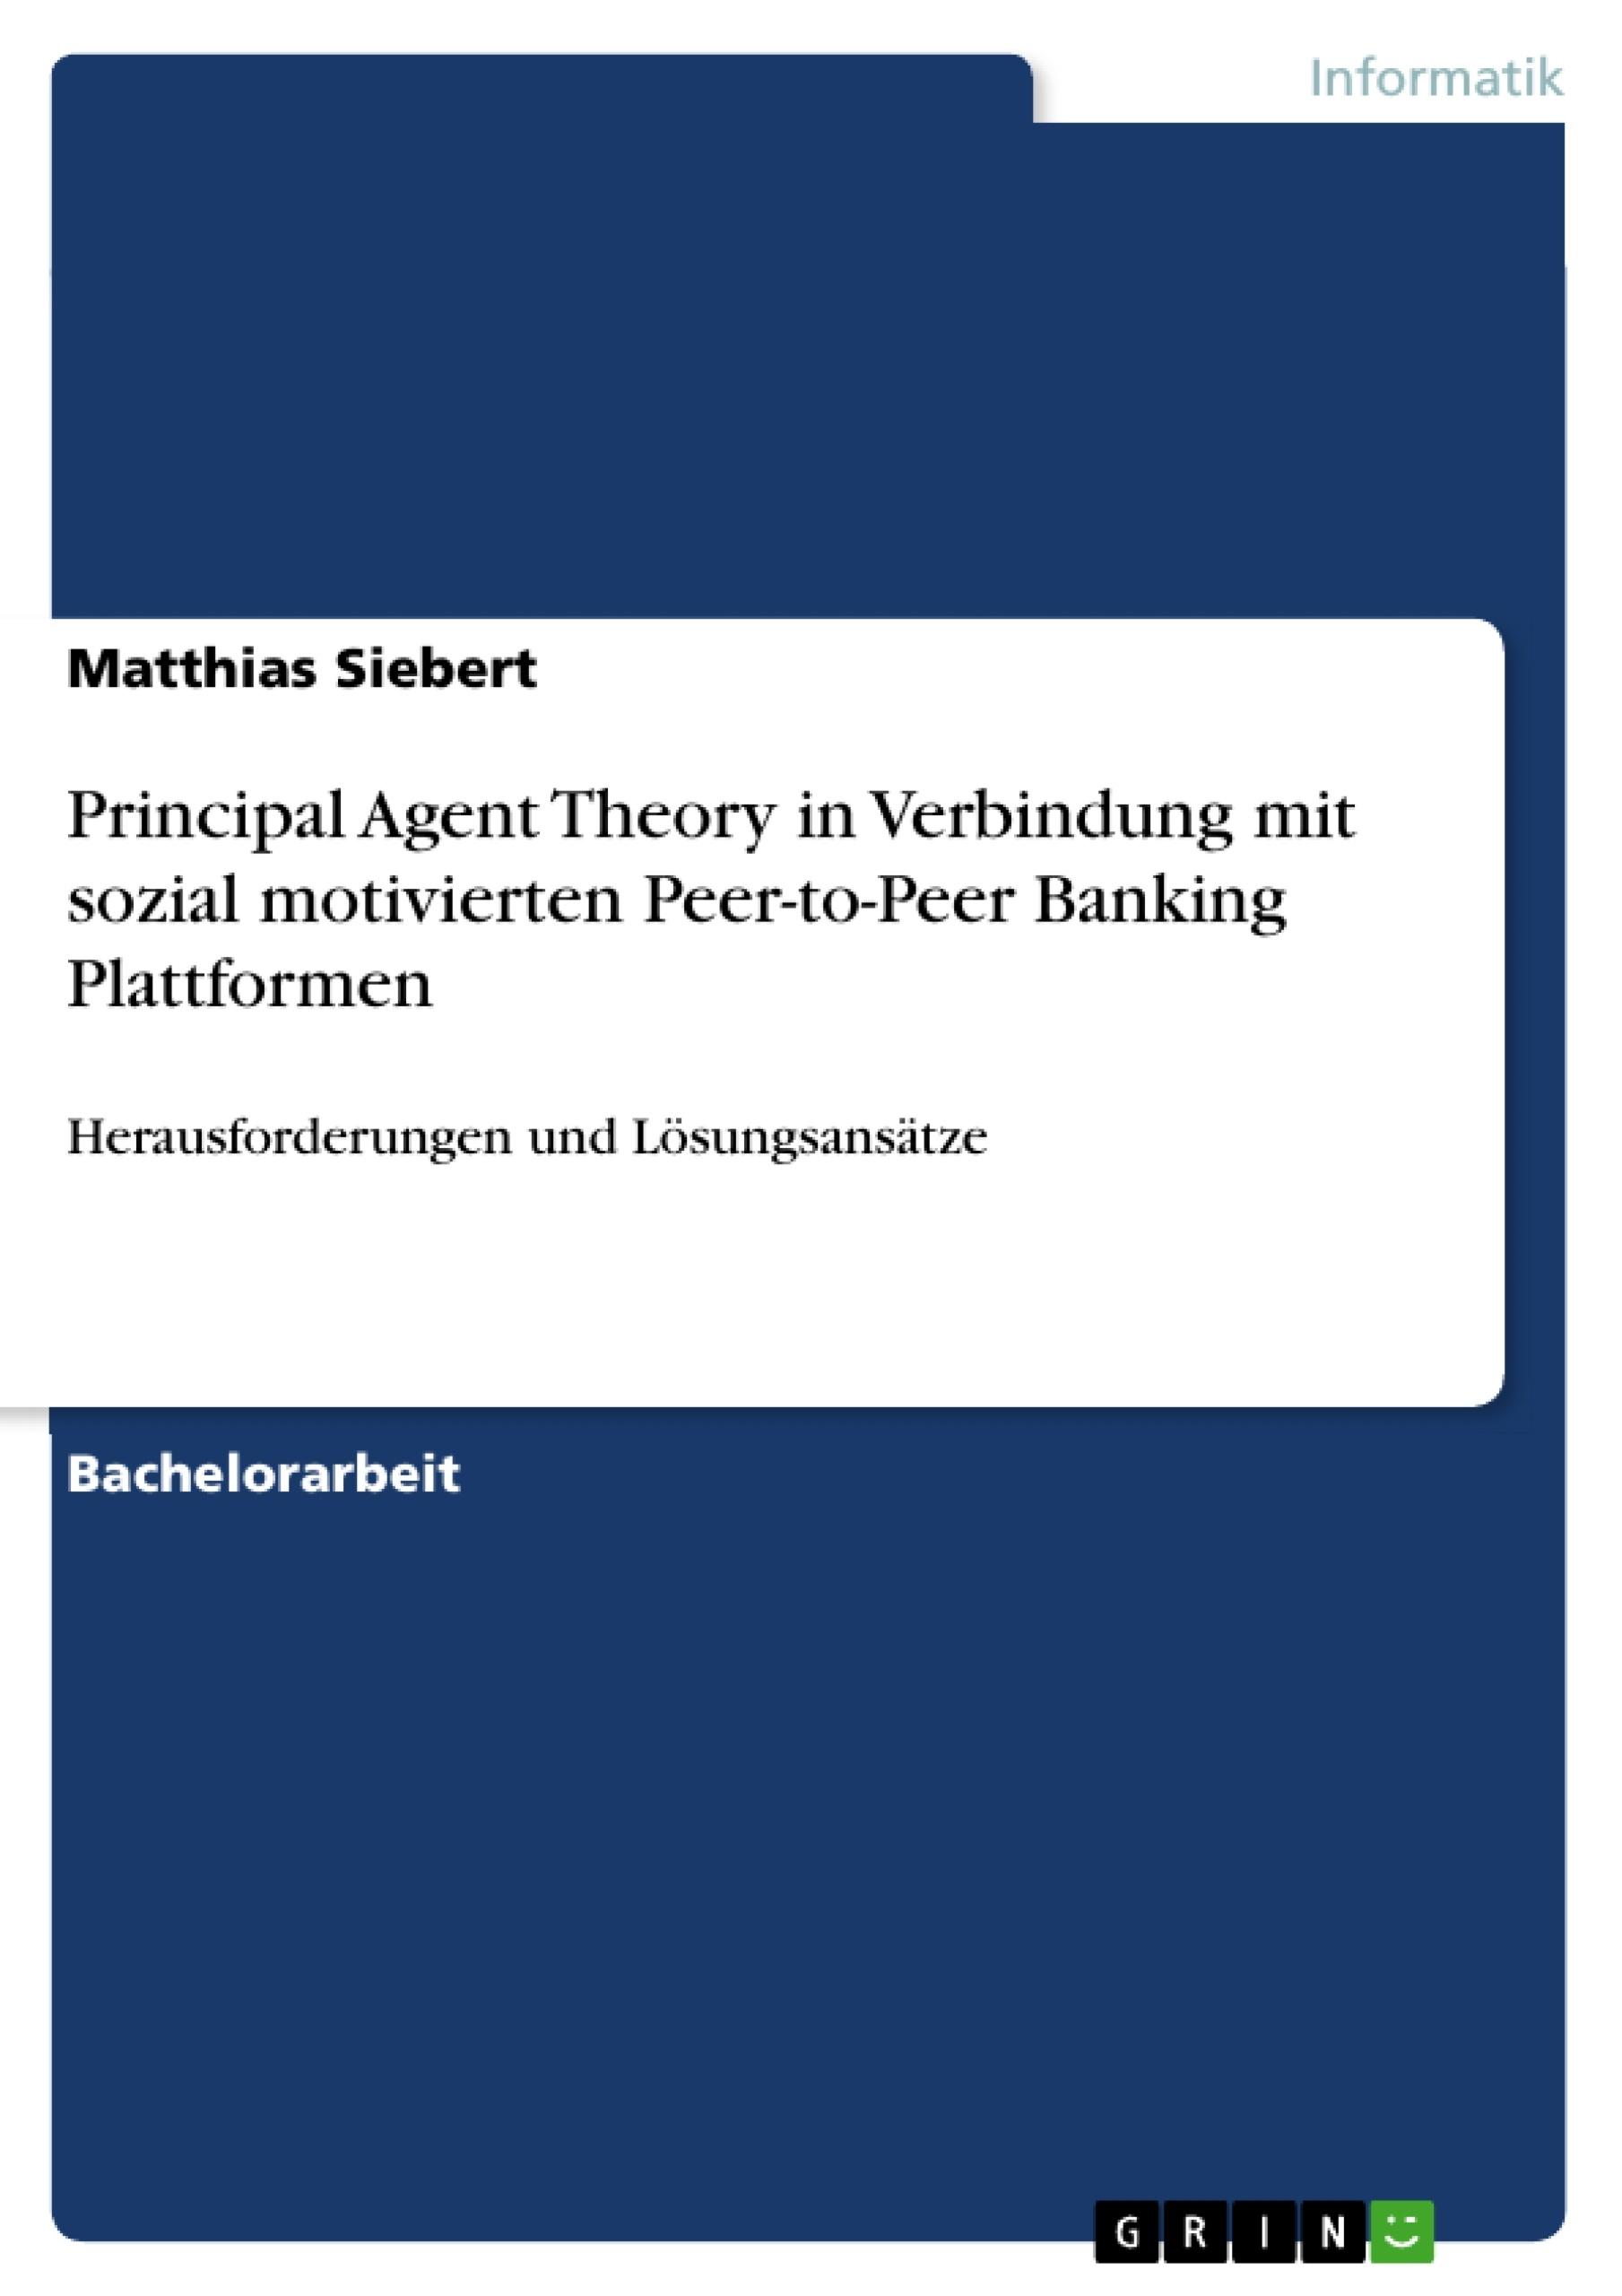 Titel: Principal Agent Theory in Verbindung mit sozial motivierten Peer-to-Peer Banking Plattformen